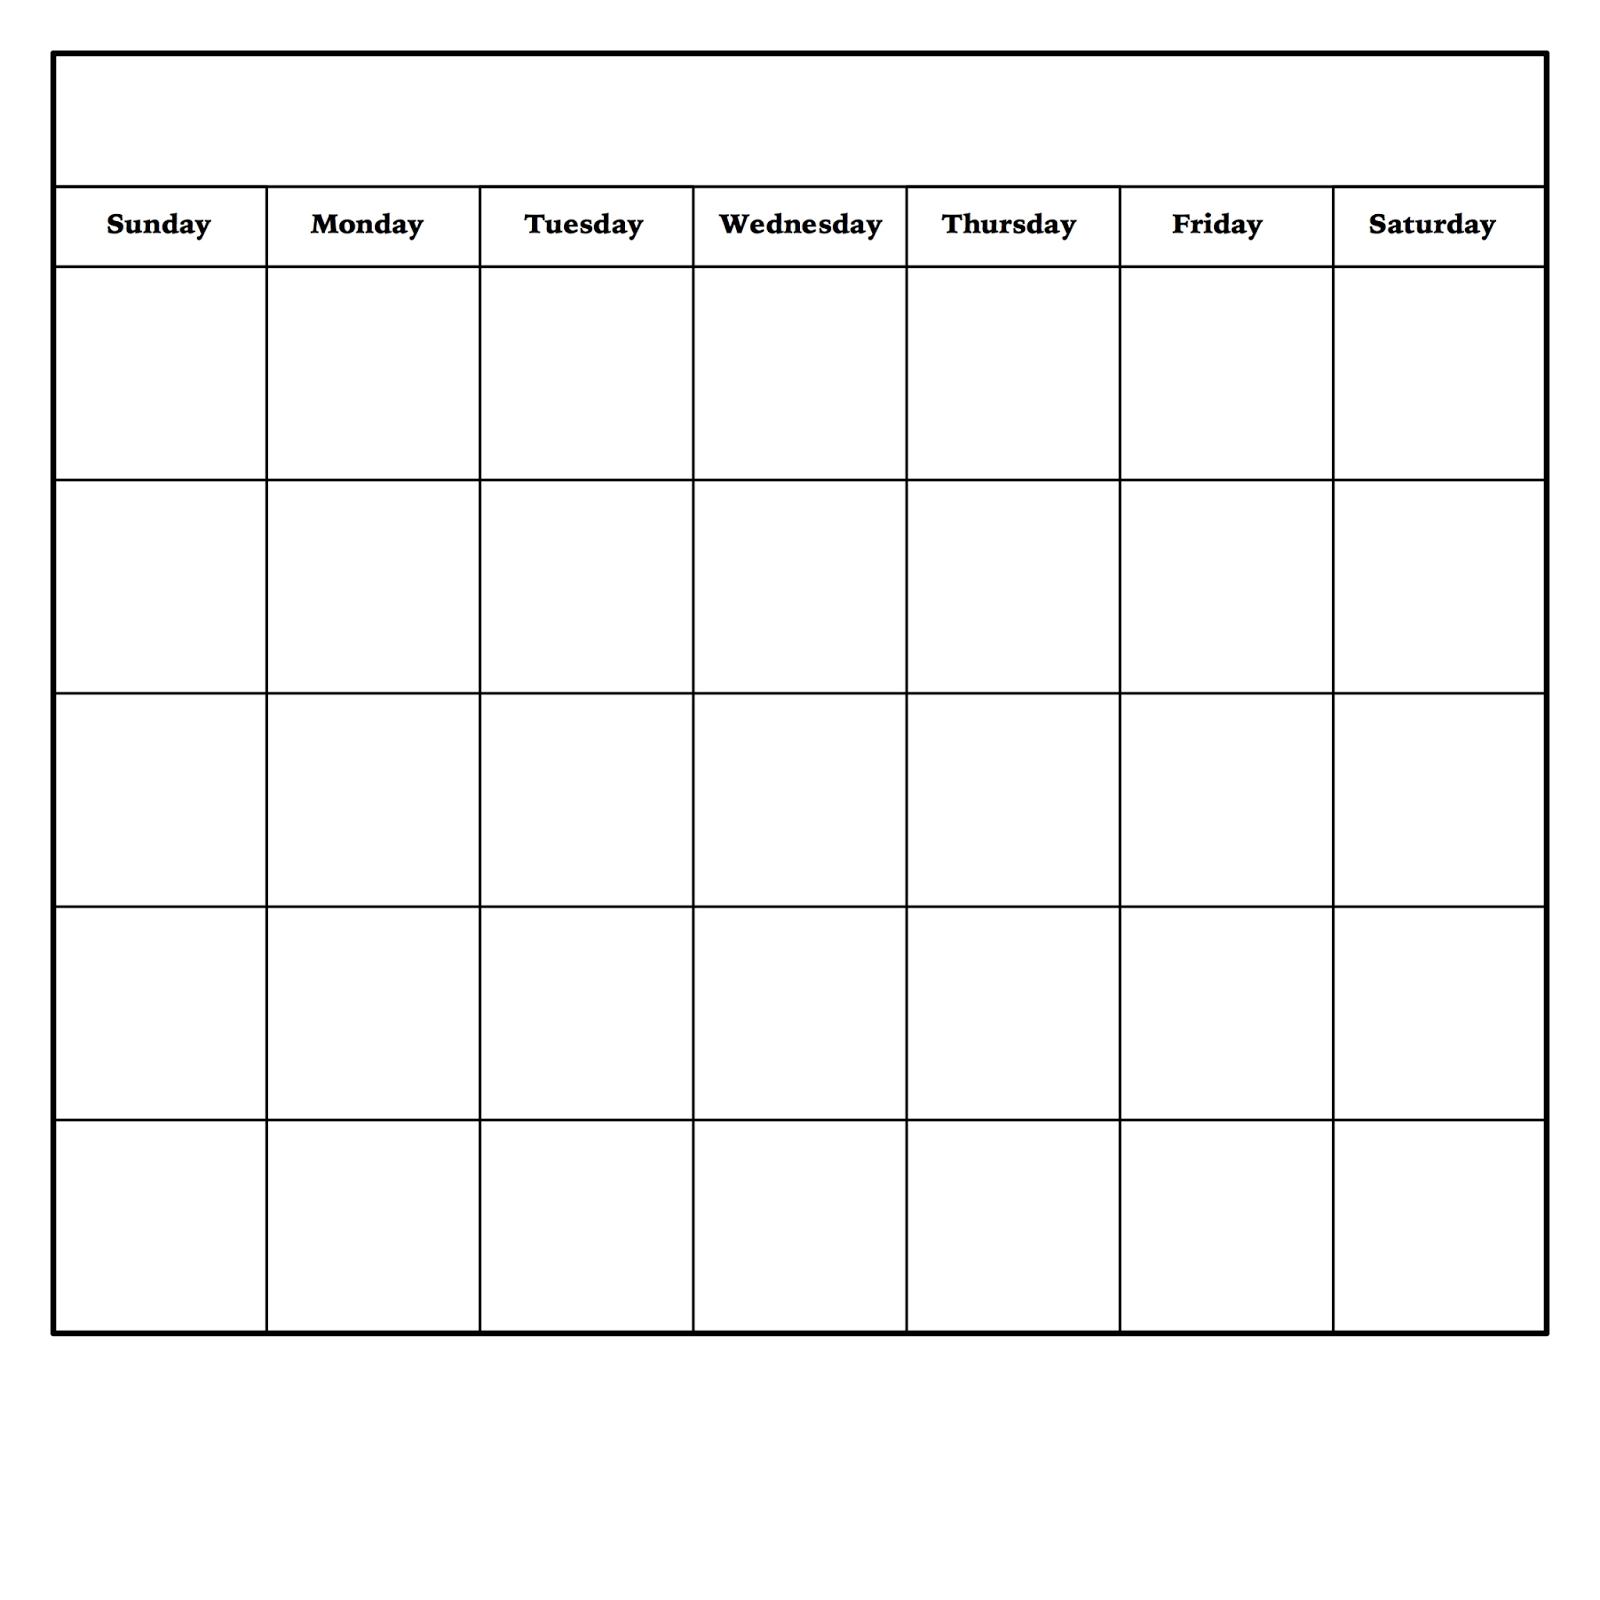 Diy Dry Erase Calendar | Blank Monthly Calendar Template in Blank Monthly Calendar To Print